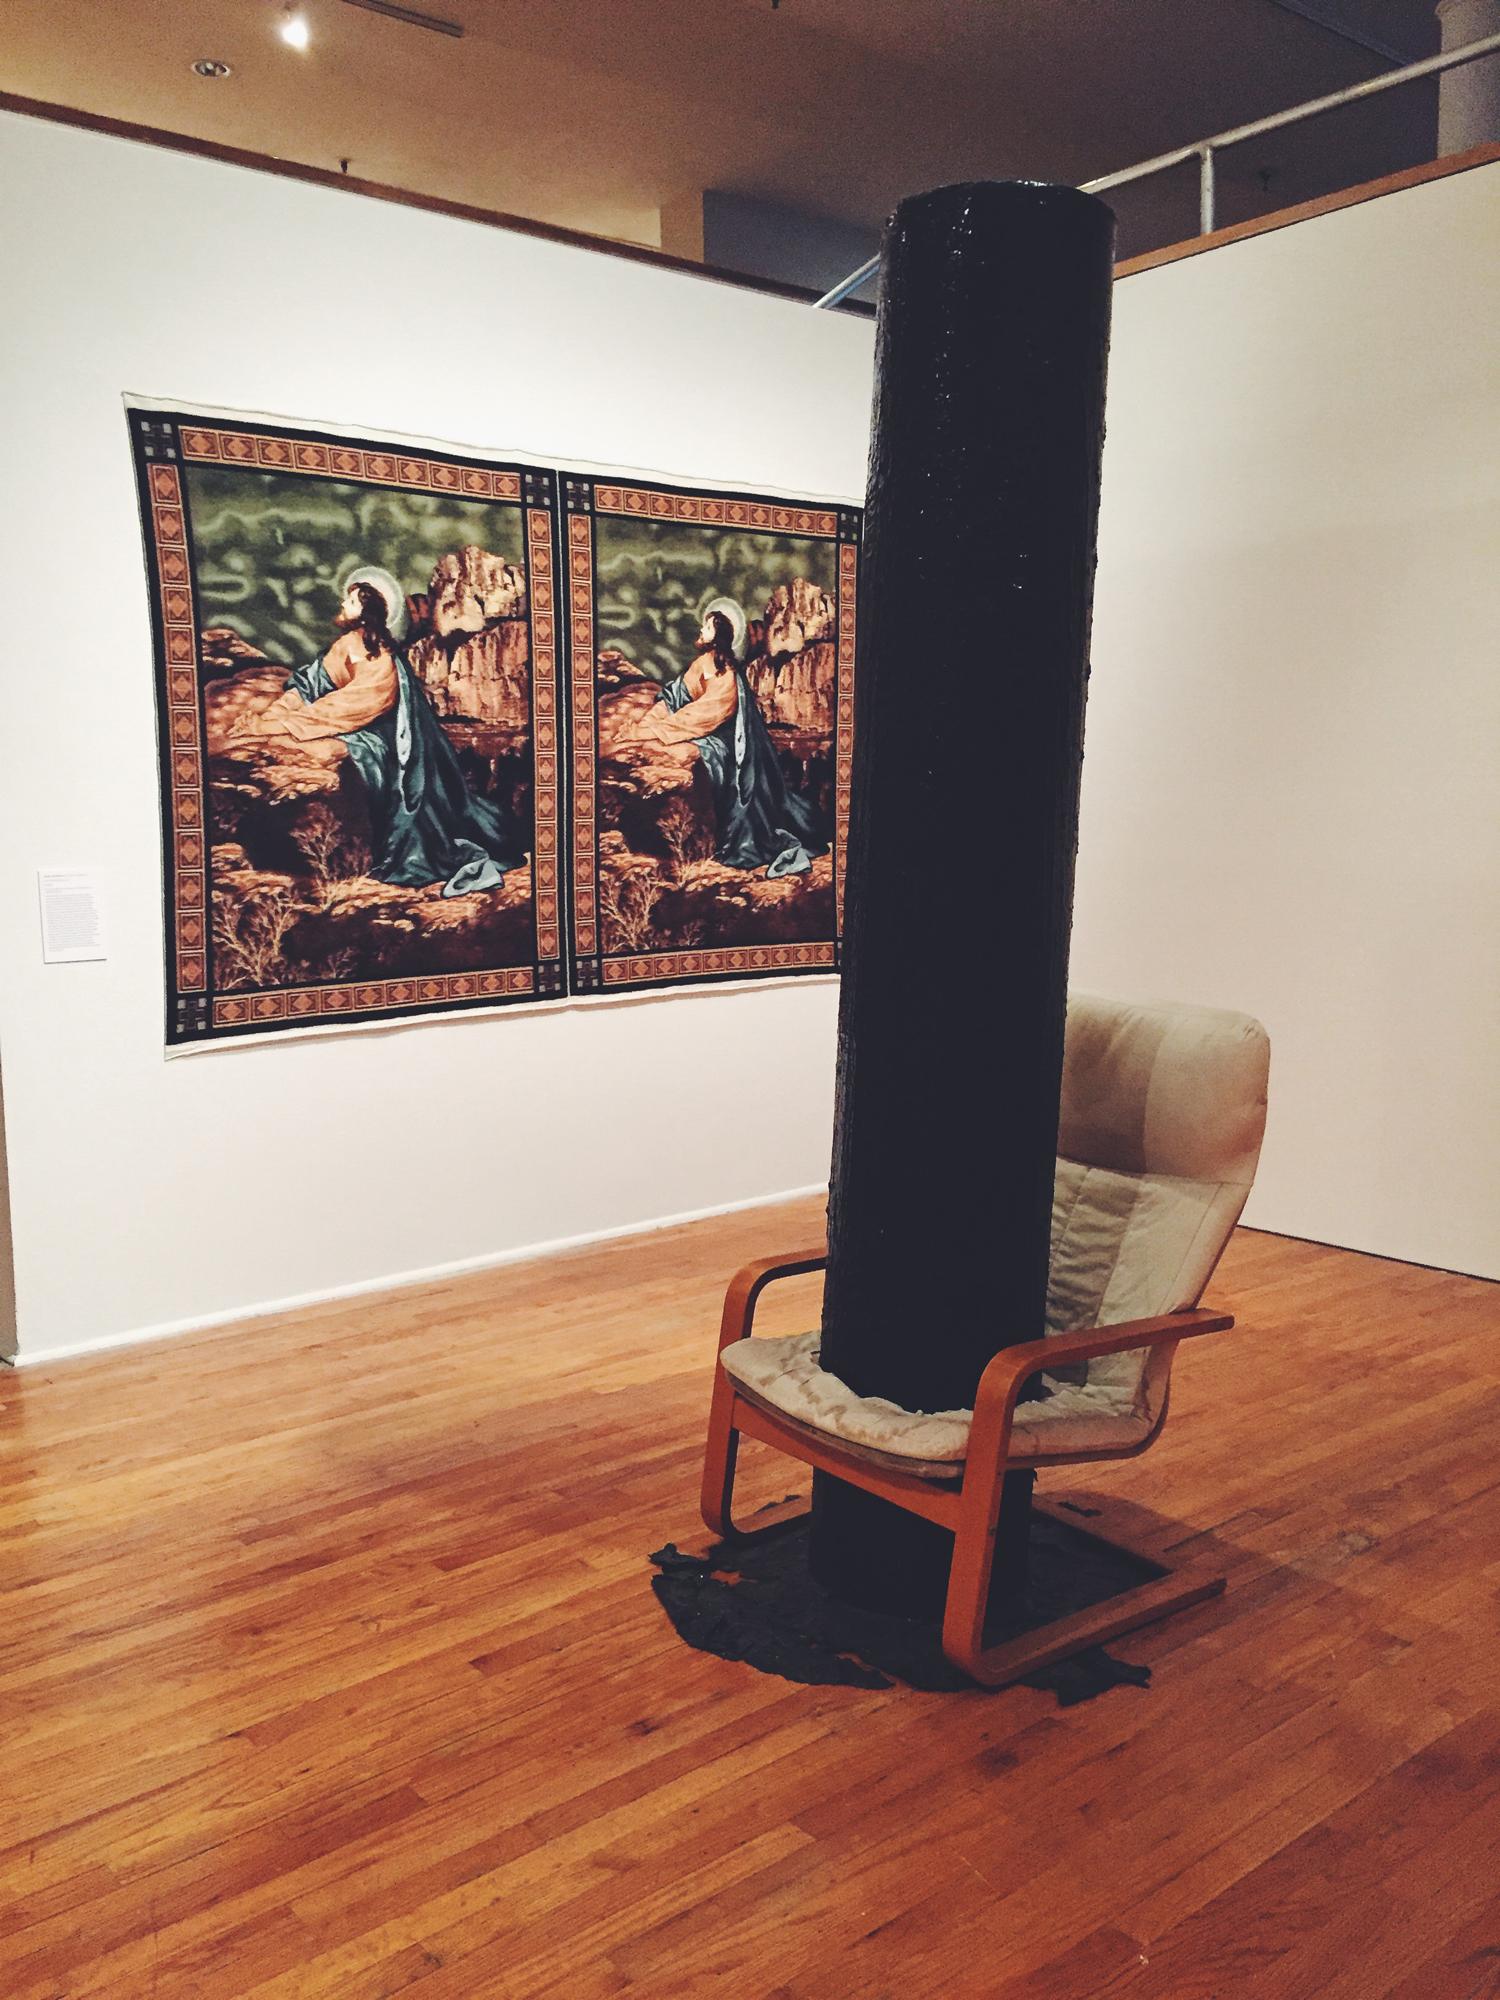 Rodney-McMillian-Artwork-Blog 3